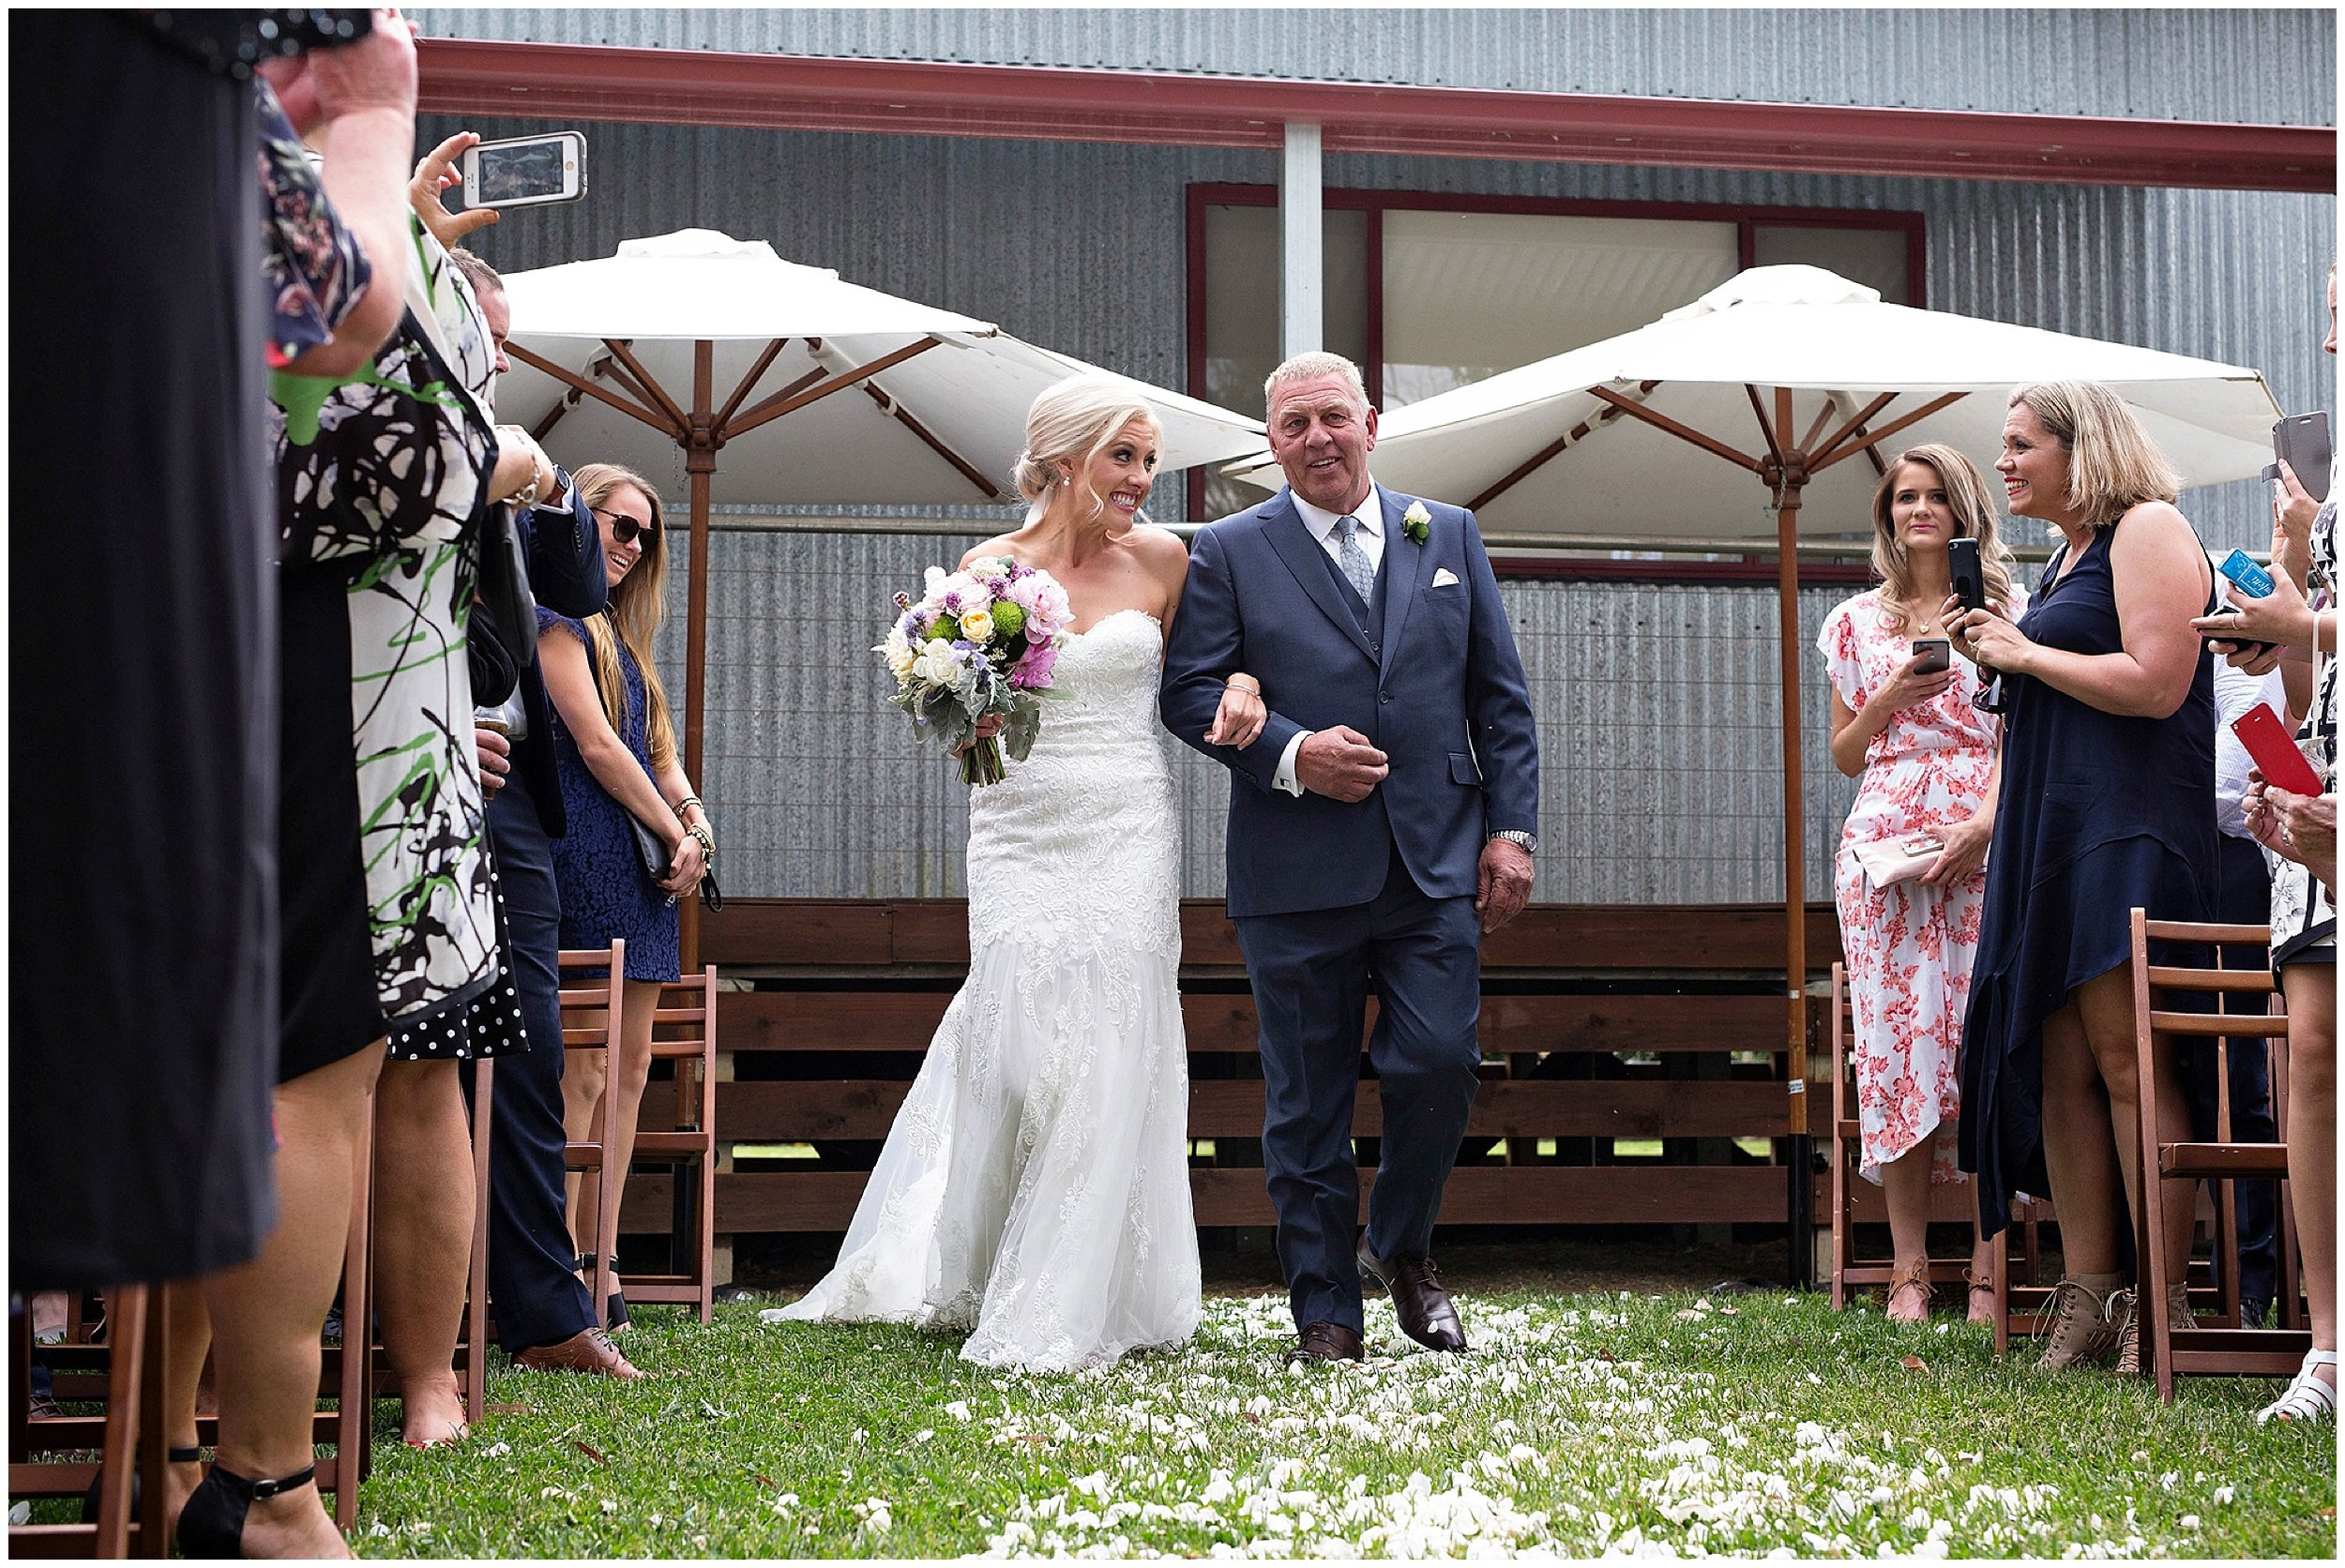 shepparton-wedding-photographer_0161.jpg